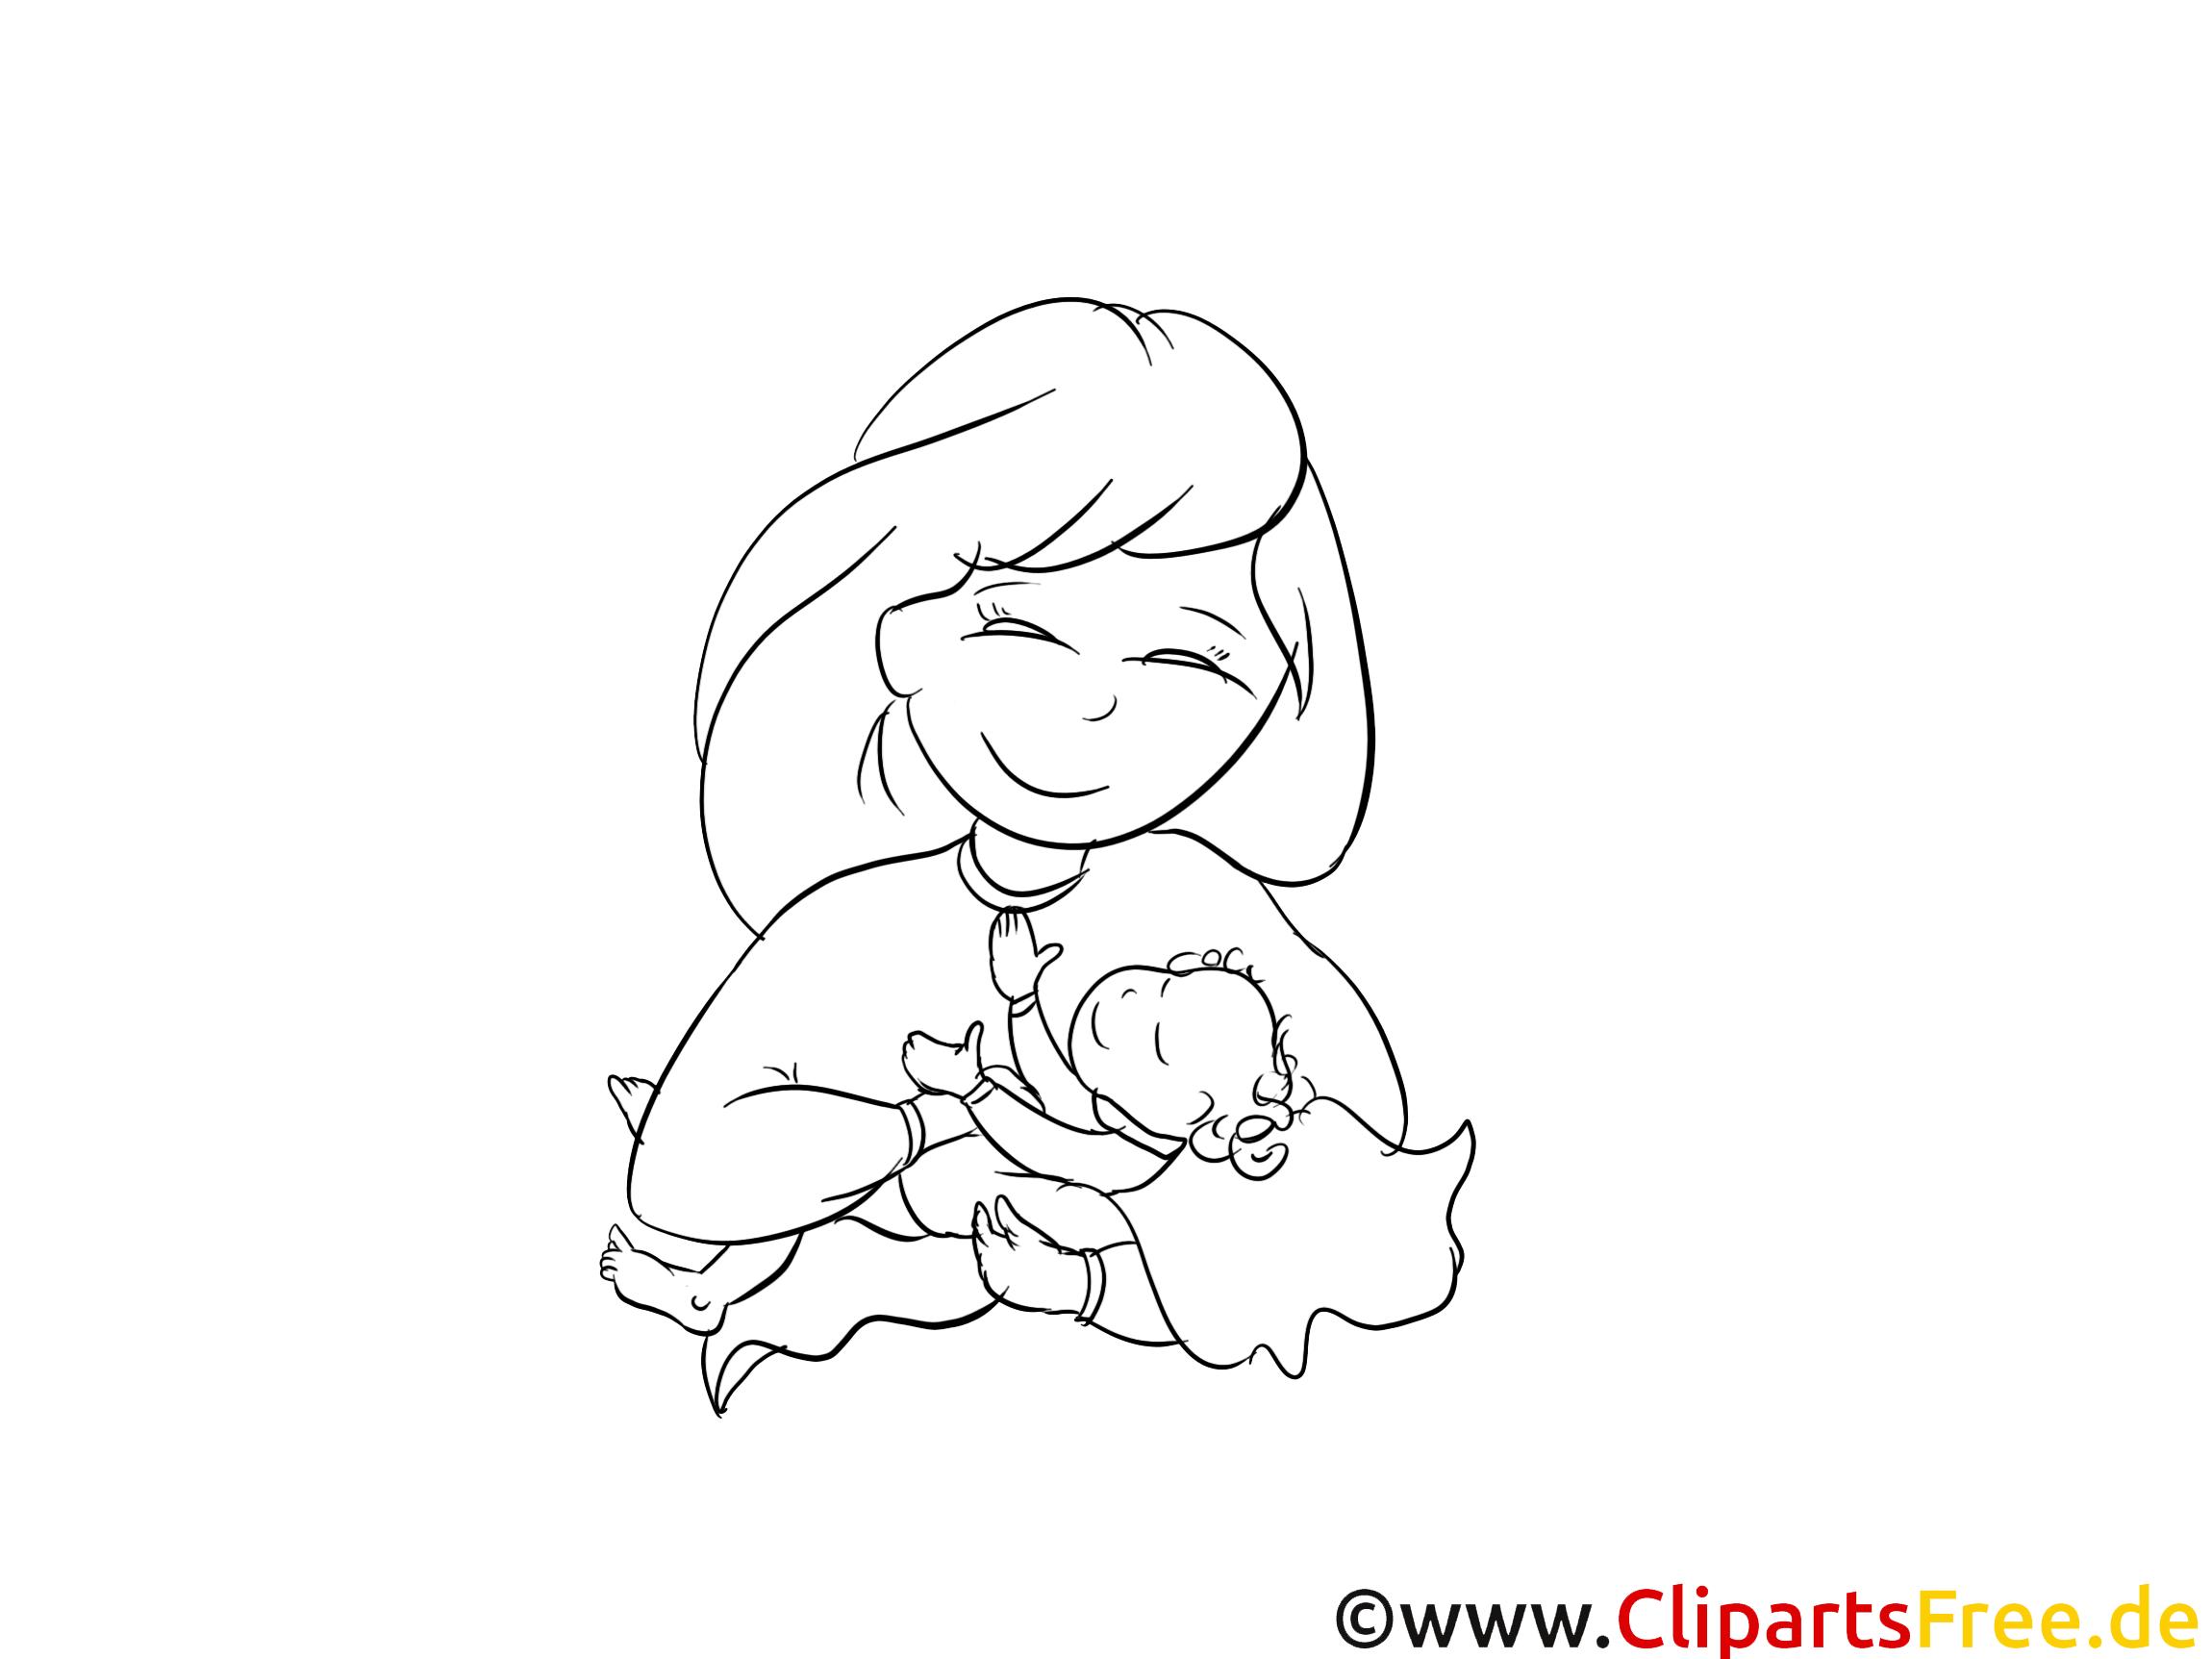 Ausmalbilder Mama Geburtstag : Gro Z Gig Malvorlagen F R Mama Bilder Framing Malvorlagen